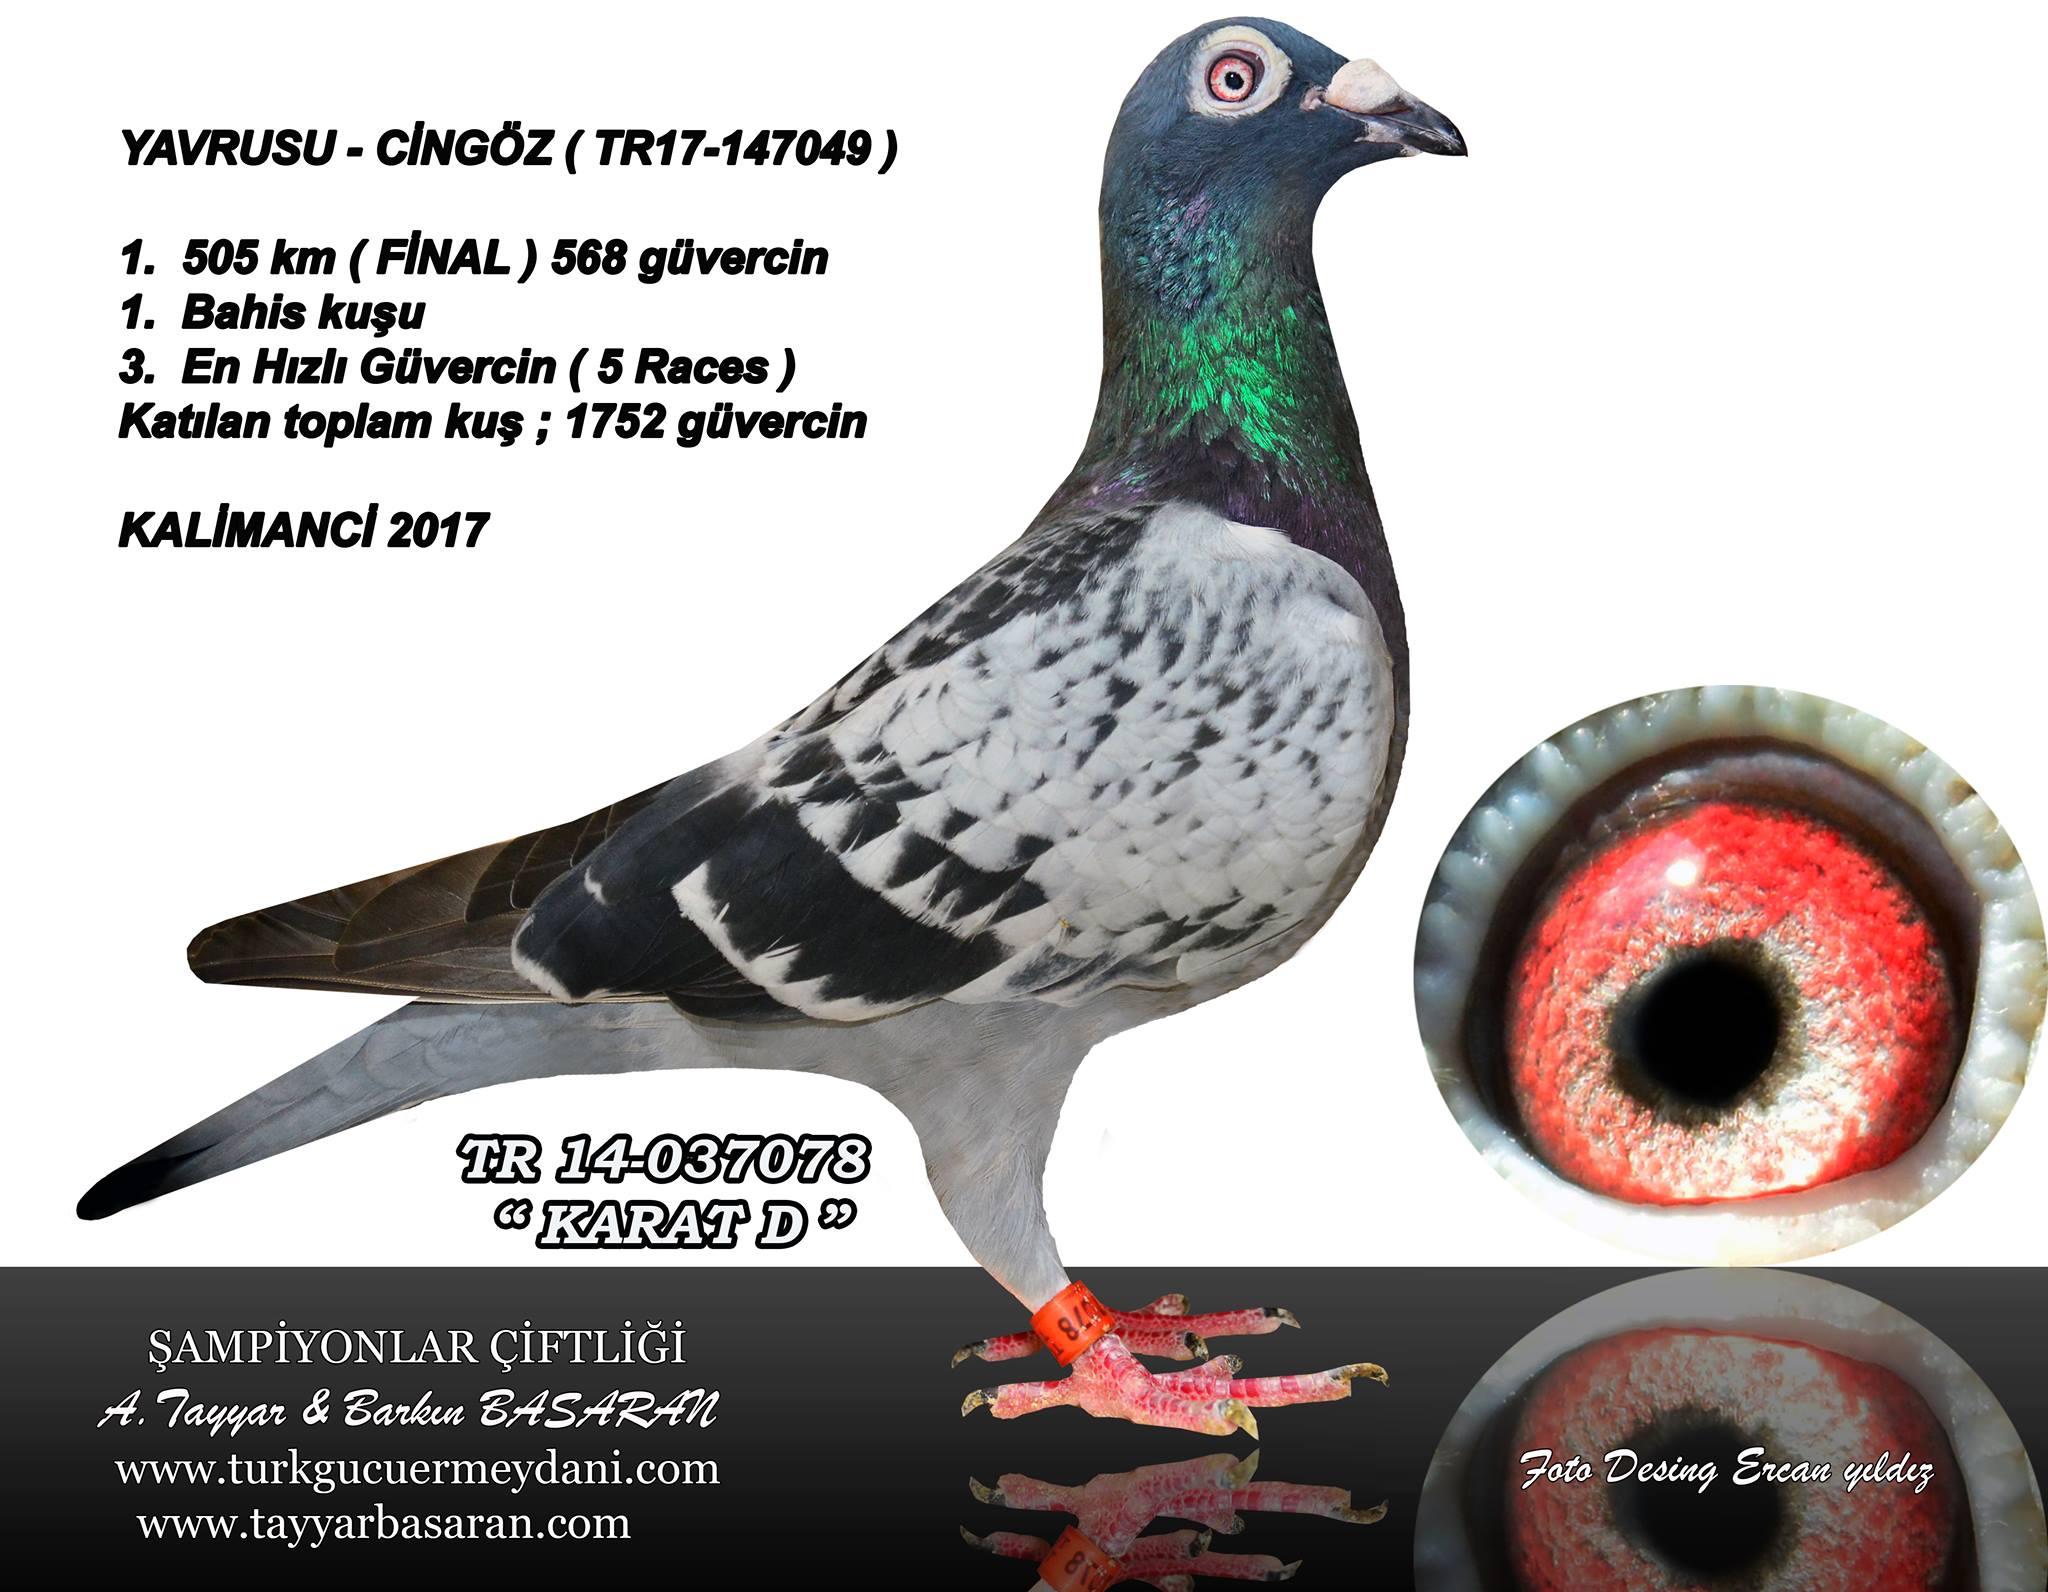 TR-18-206929 1.inci Kalimanci erkek kardşi 2017